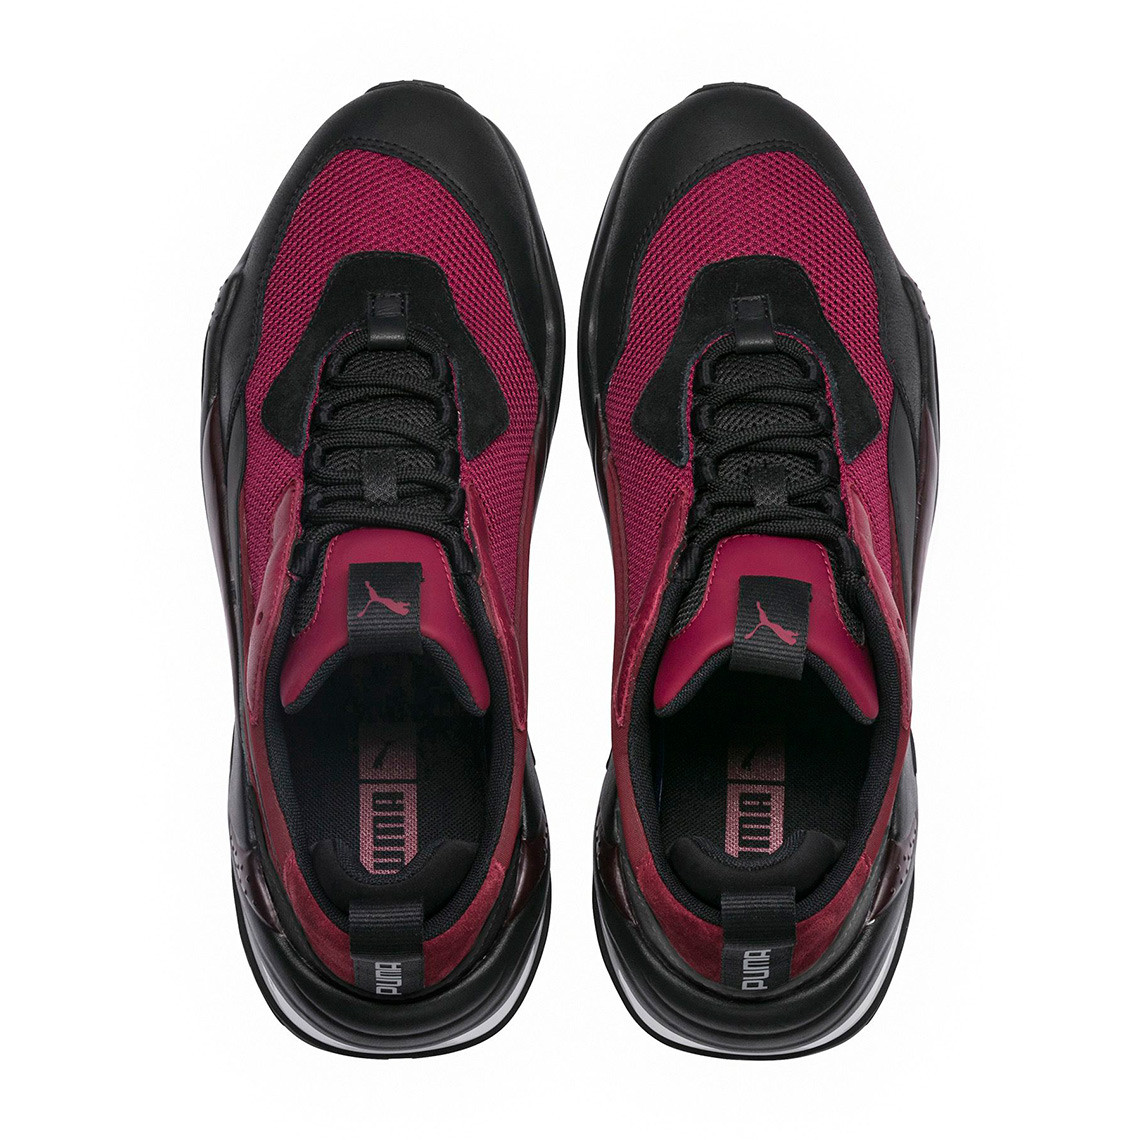 puma thunder spectra burgundy 2